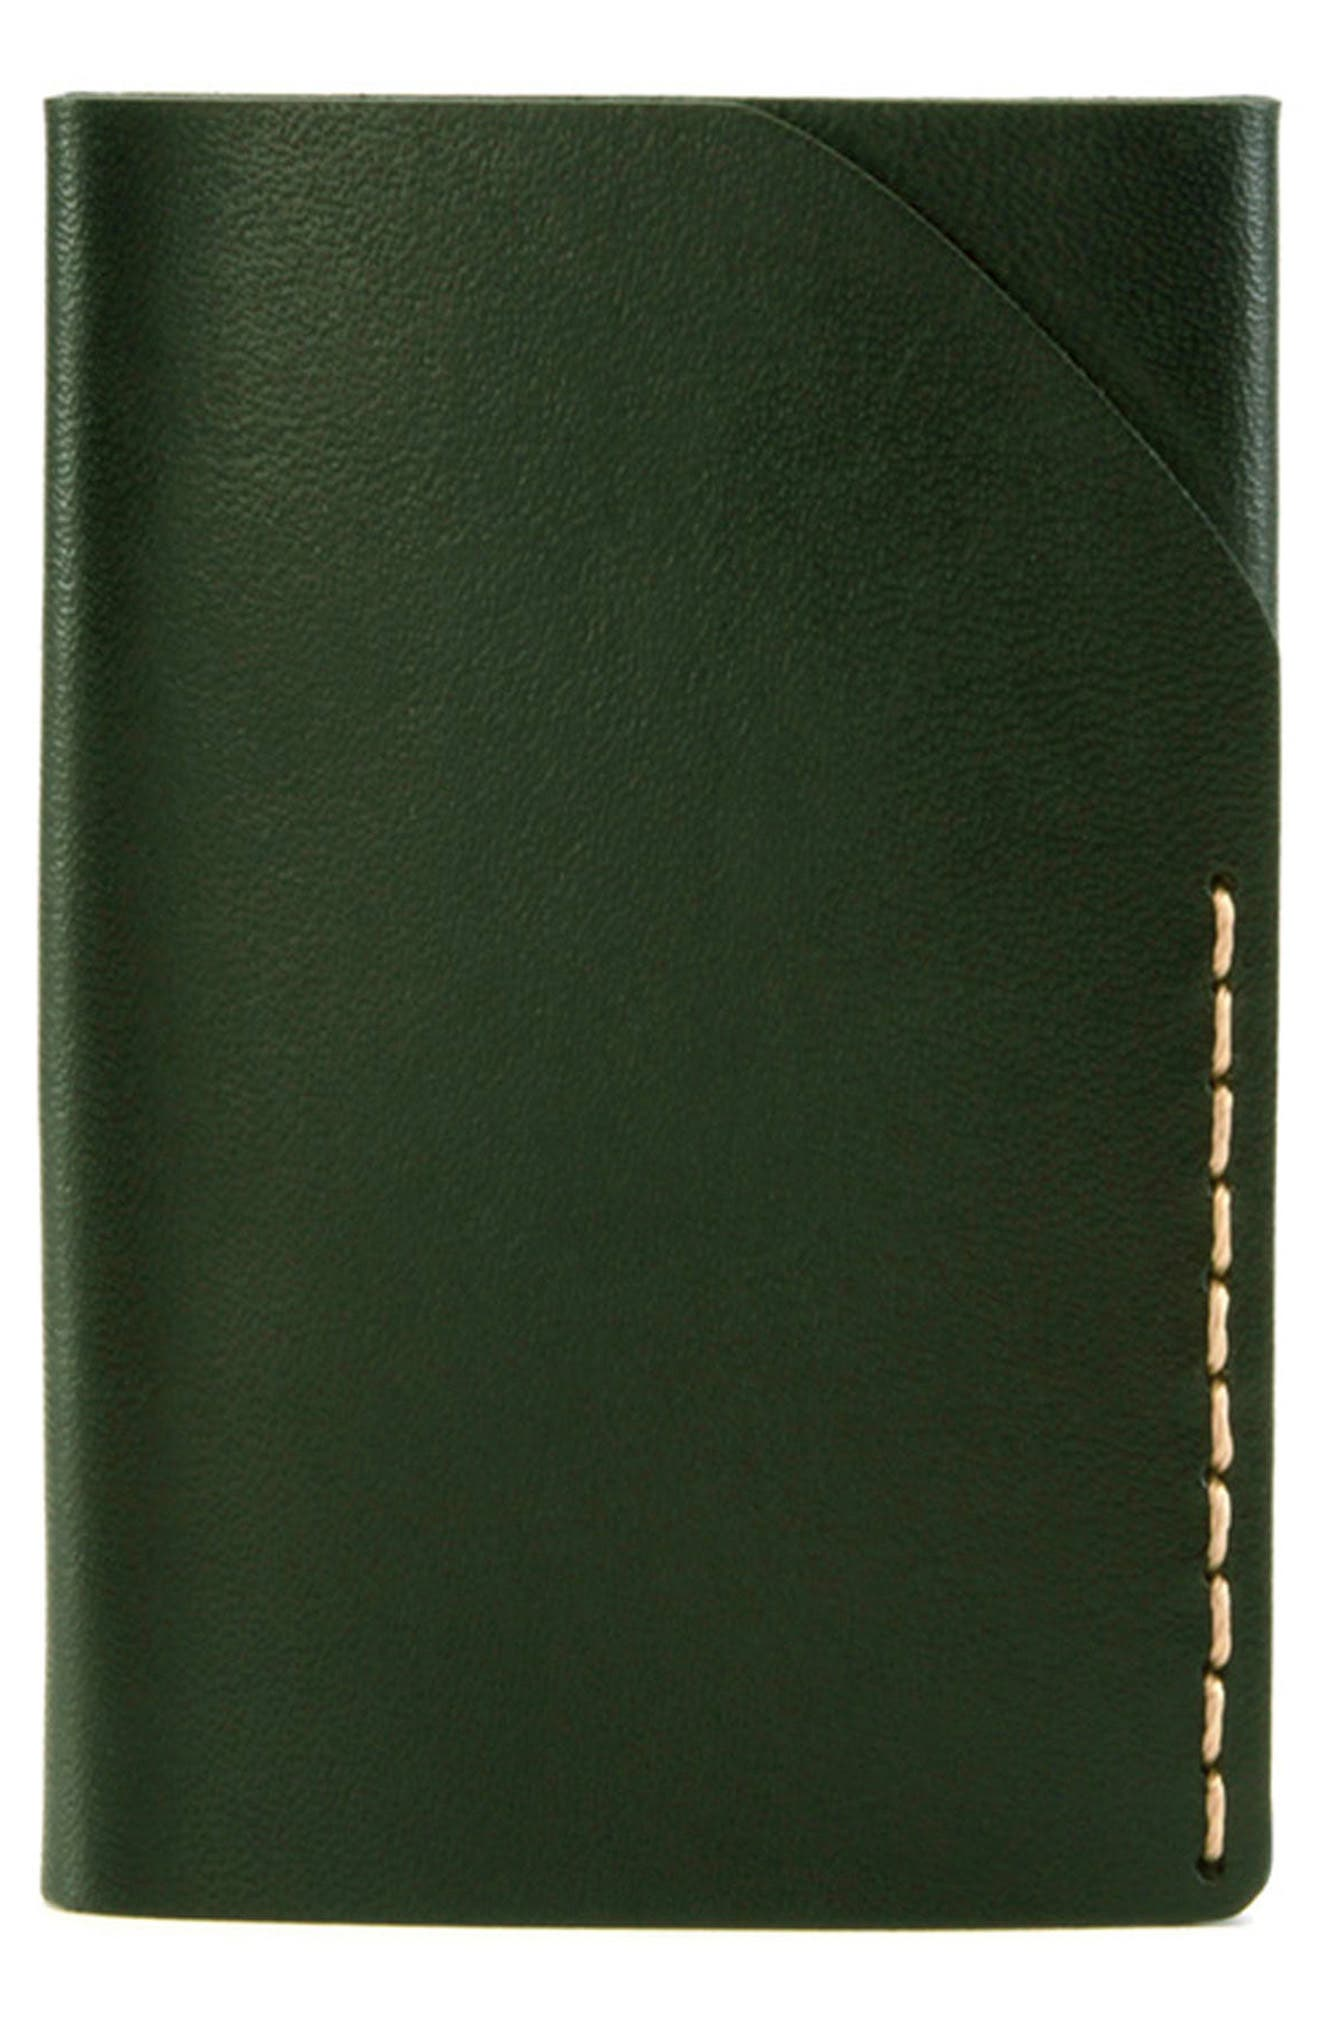 Main Image - Ezra Arthur No. 2 Leather Card Case